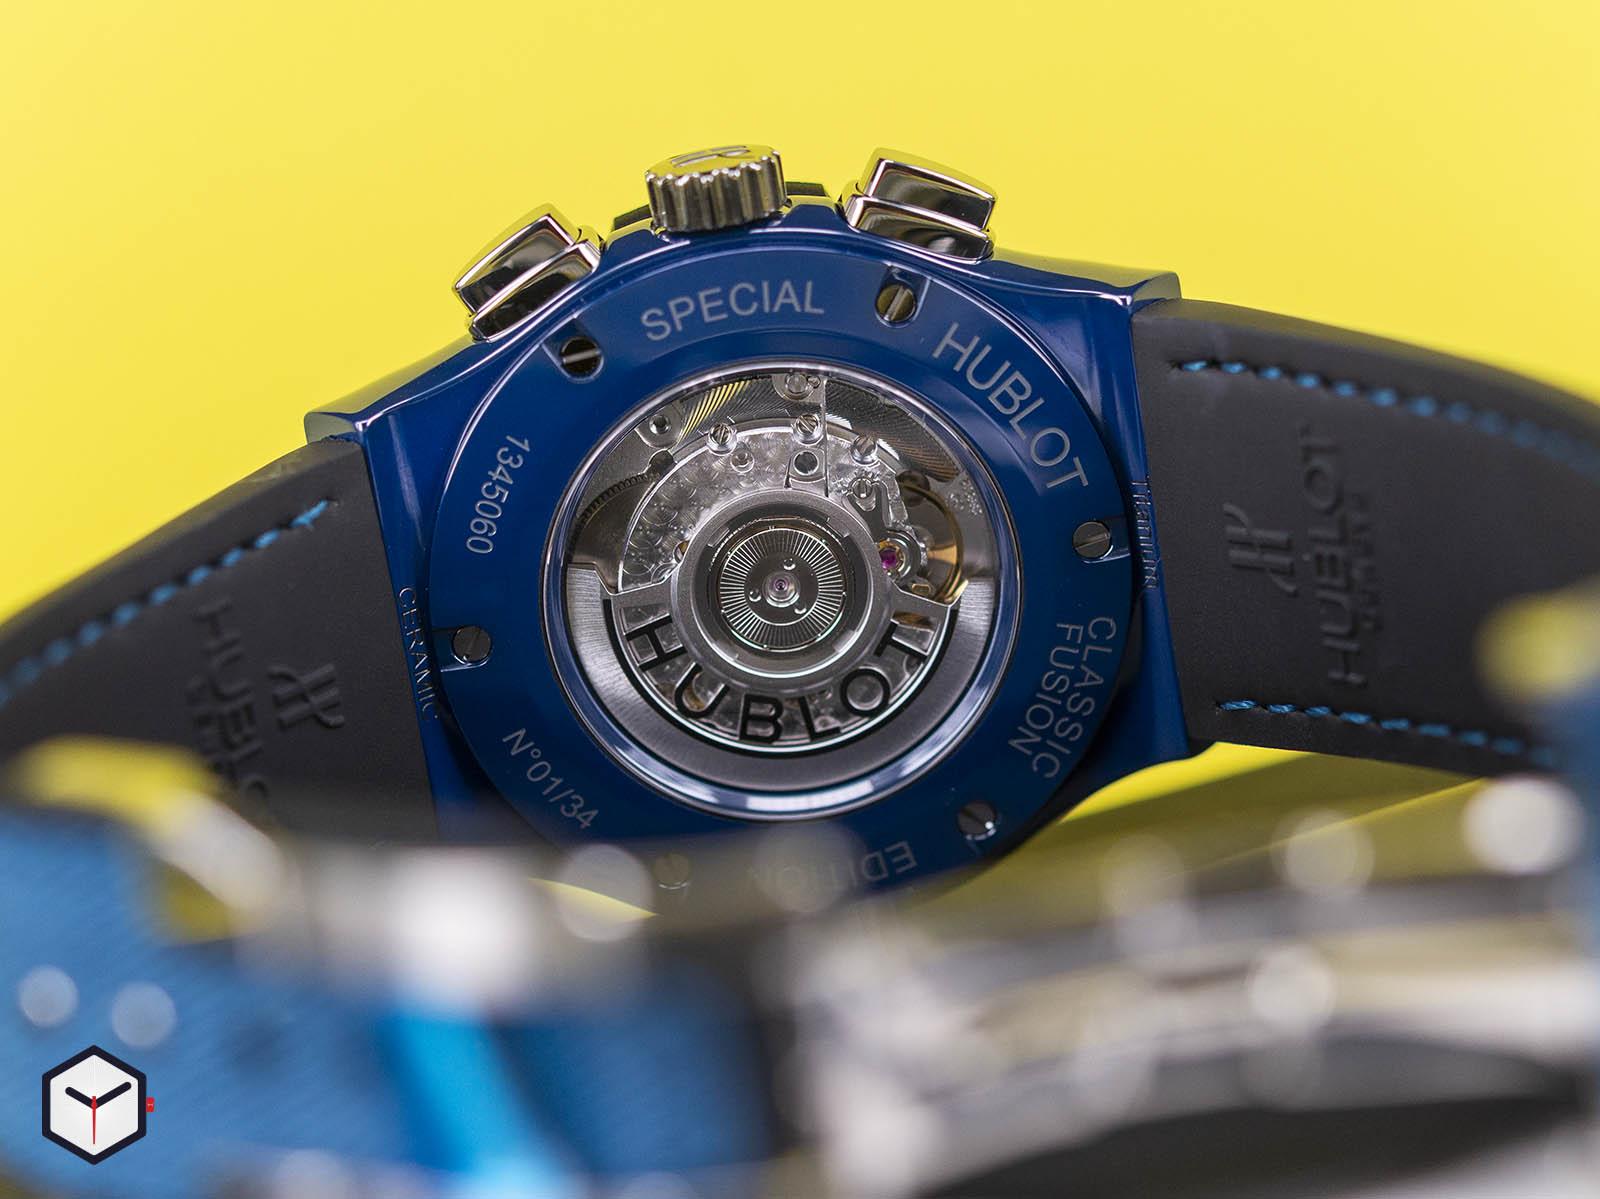 525-ex-1170-nr-bod18-hublot-classic-fusion-aerofusion-bosphorus-blue-7.jpg